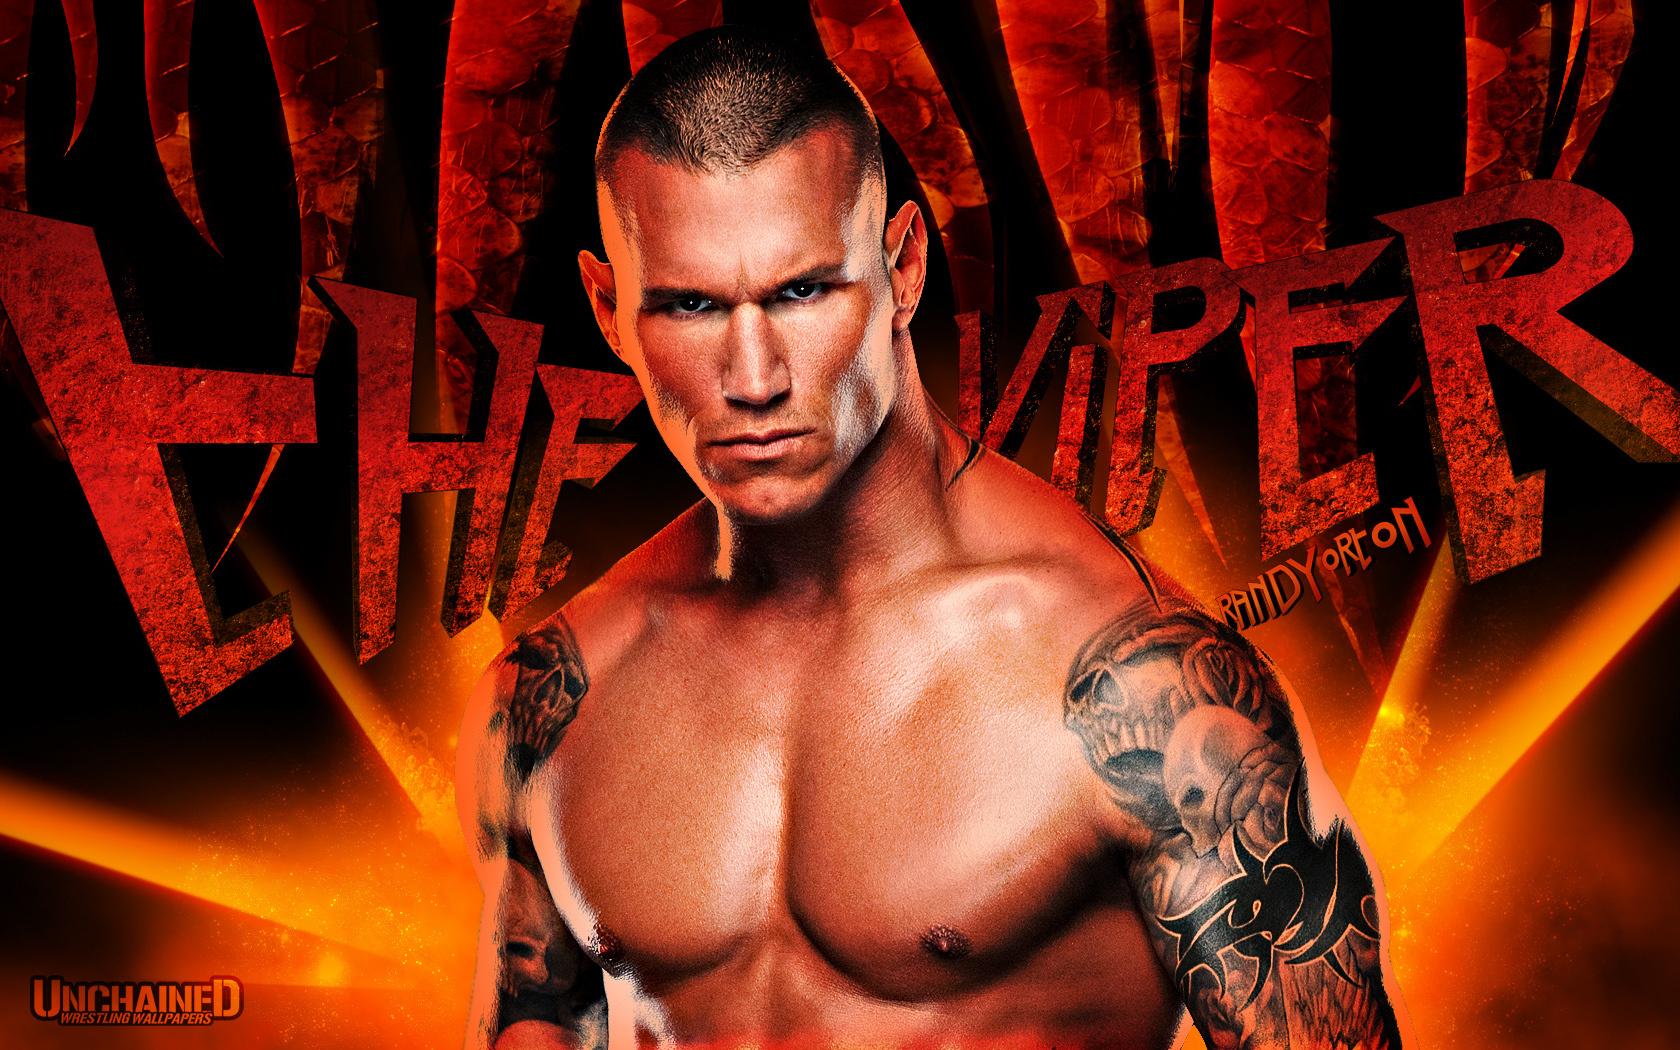 Wrestler Randy Orton - age: 41